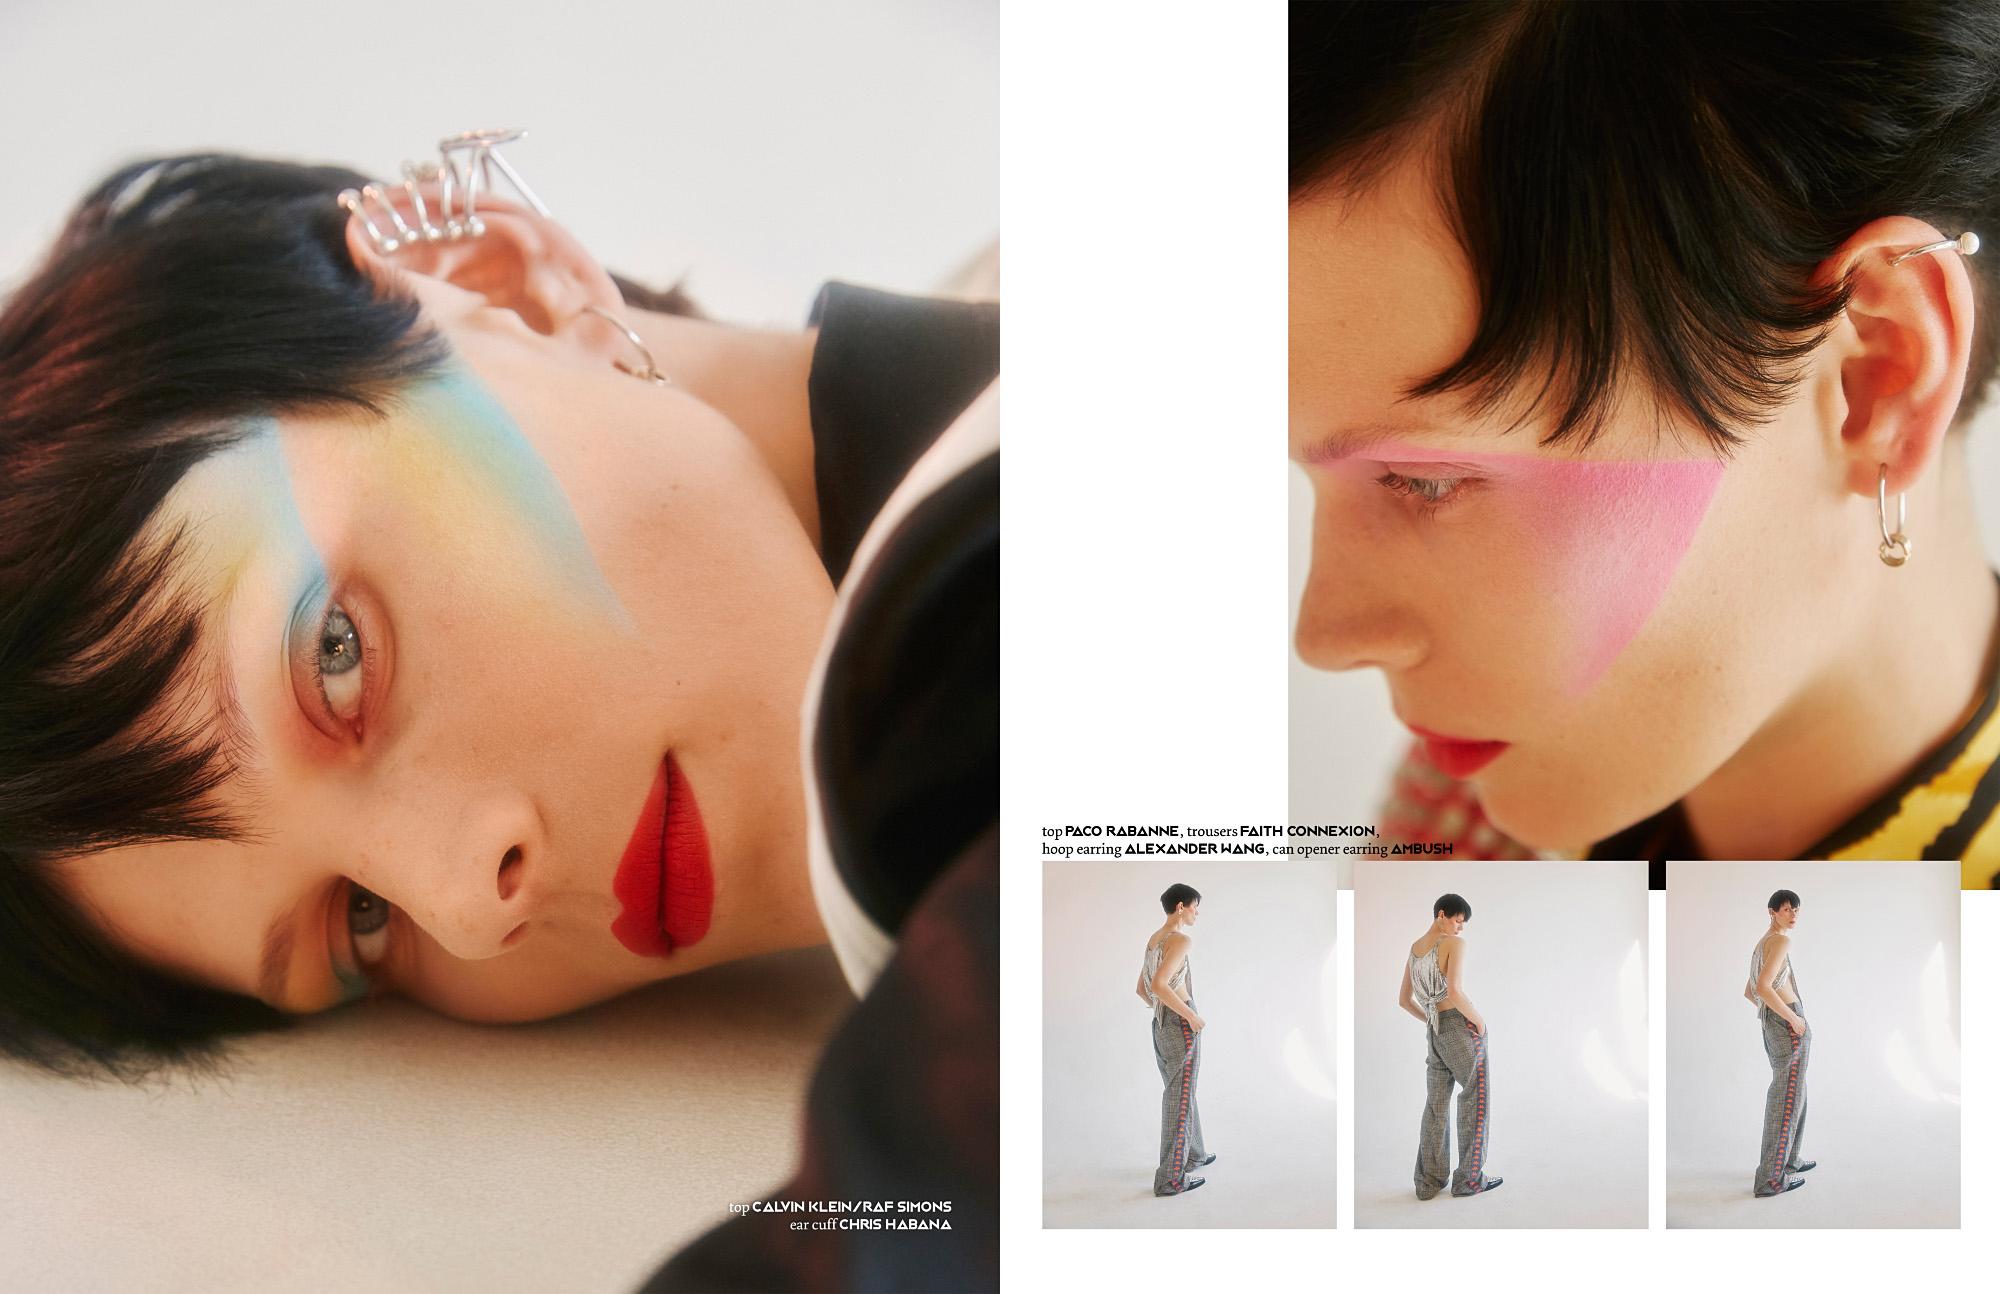 This PIBE online exclusive has been produced by:  Photography / Ruo Bing Li Styling / Krisana Sotelo Make up / Chiao Li Hsu Hair / Takayoshi Tsukisawa Model / Indre Aleksium @Silent Models NY